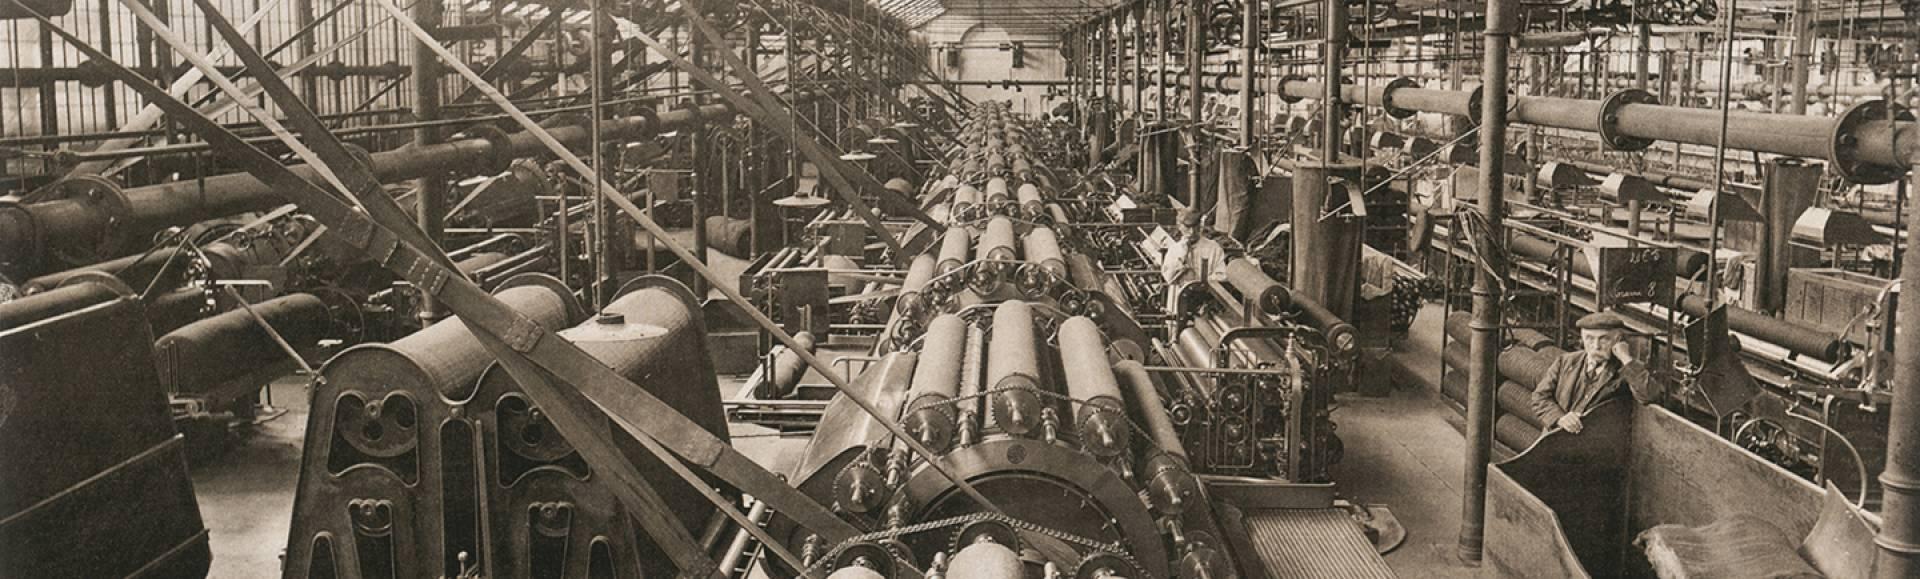 Heritage balsan ancienne usine chateauroux